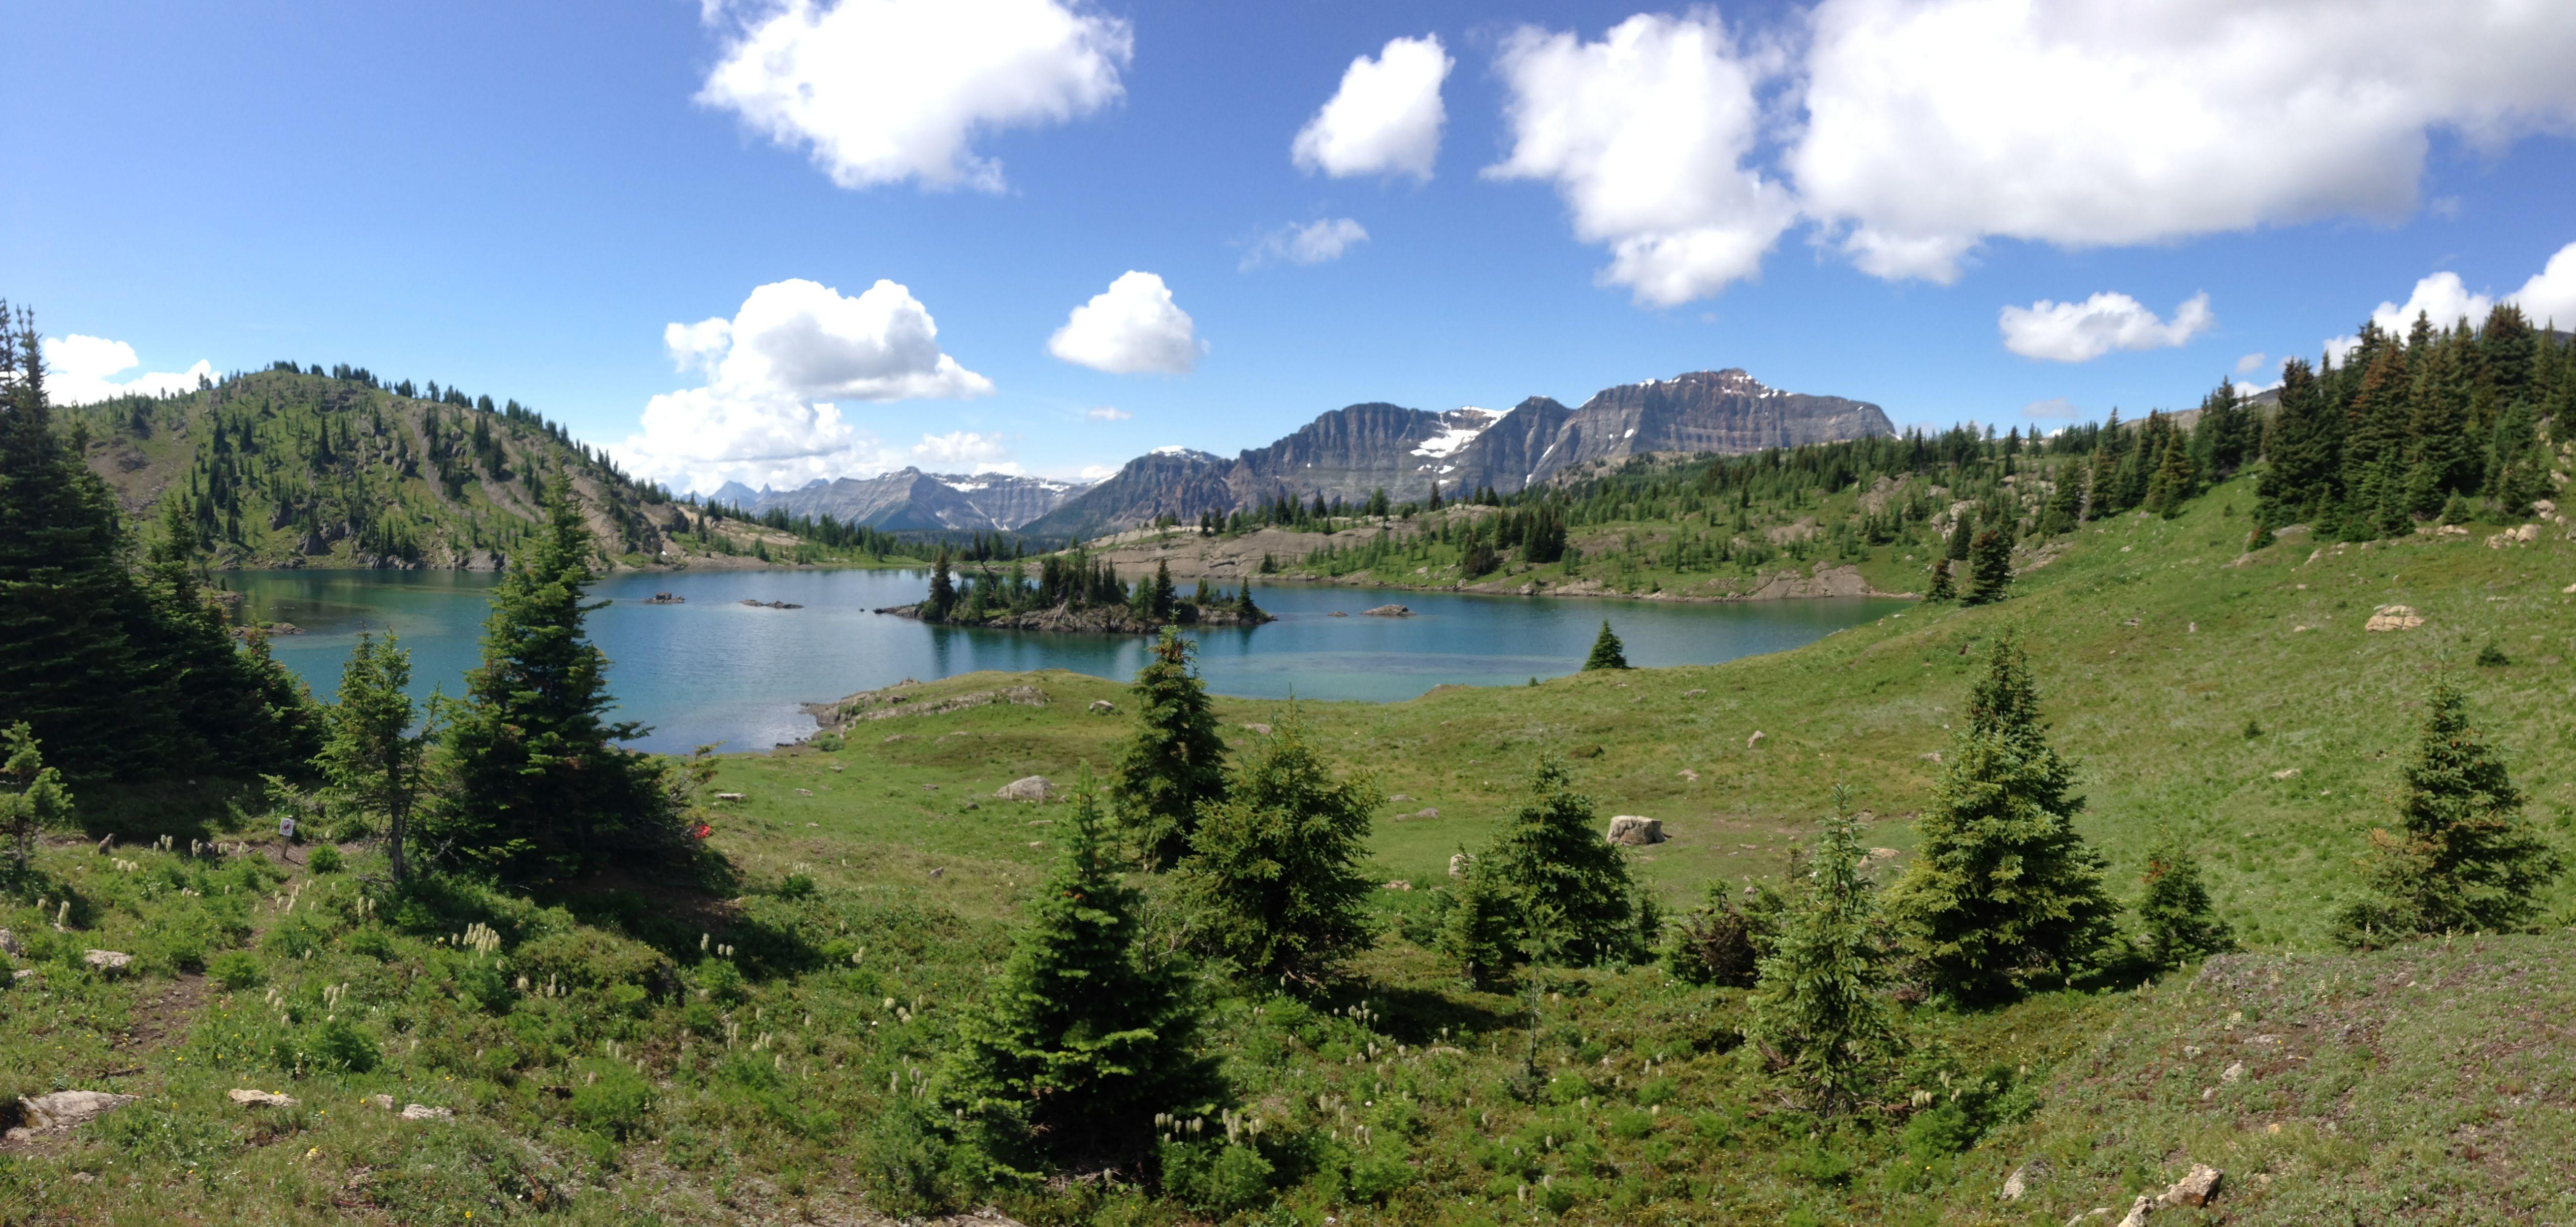 [OC] Rock Isle Lake Sunshine Meadows. Banff Alberta. [5232x2492]